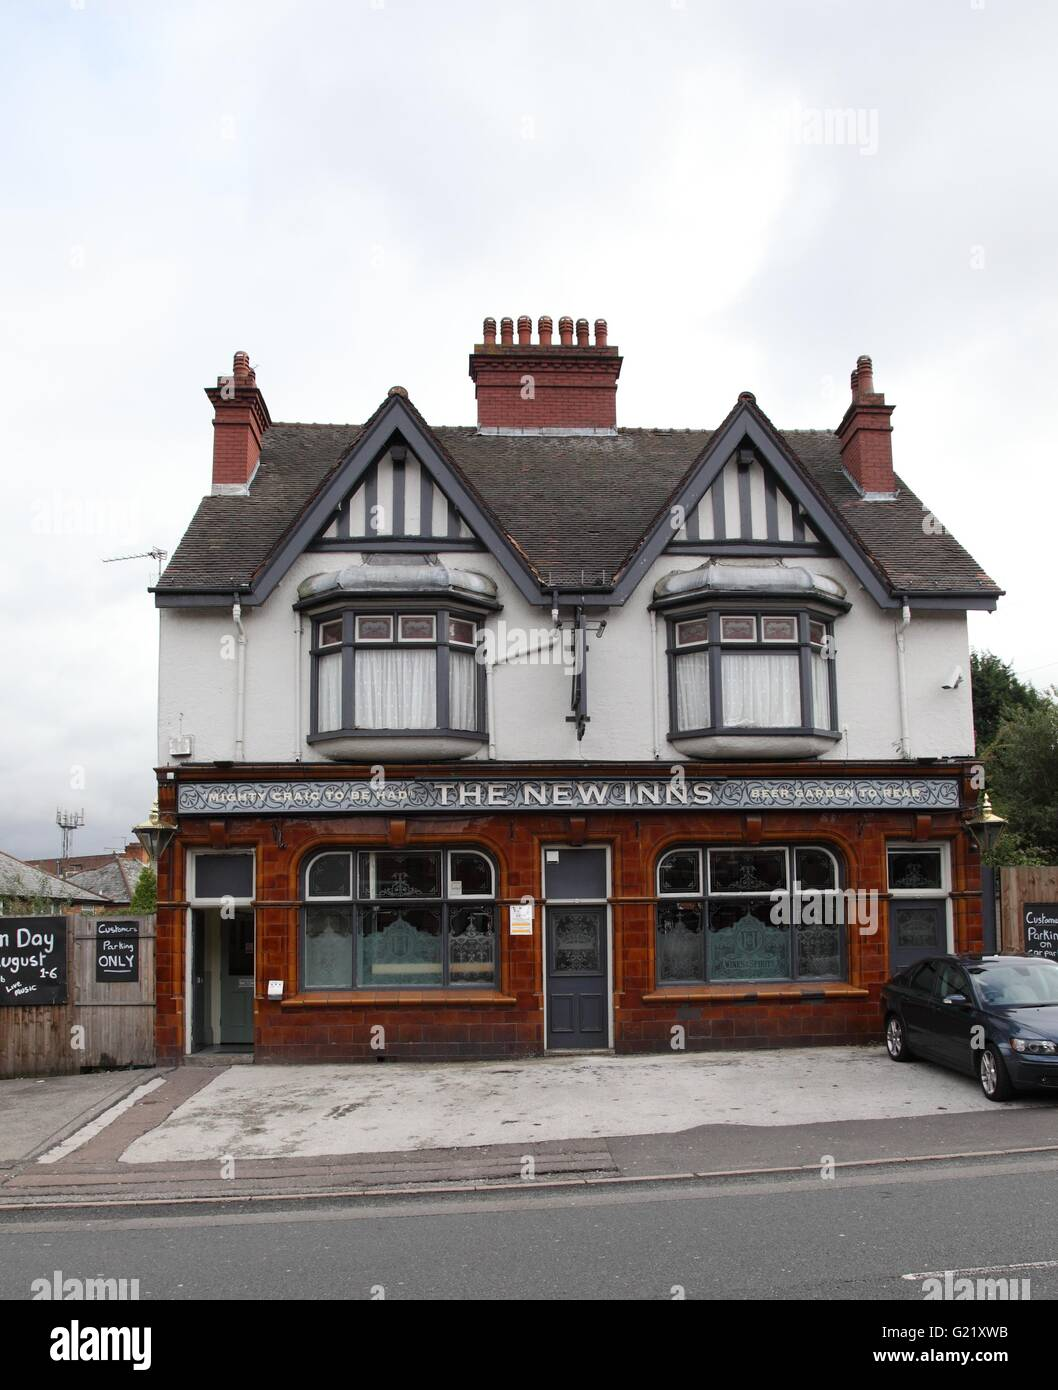 New Inns pub, Birmingham - Stock Image